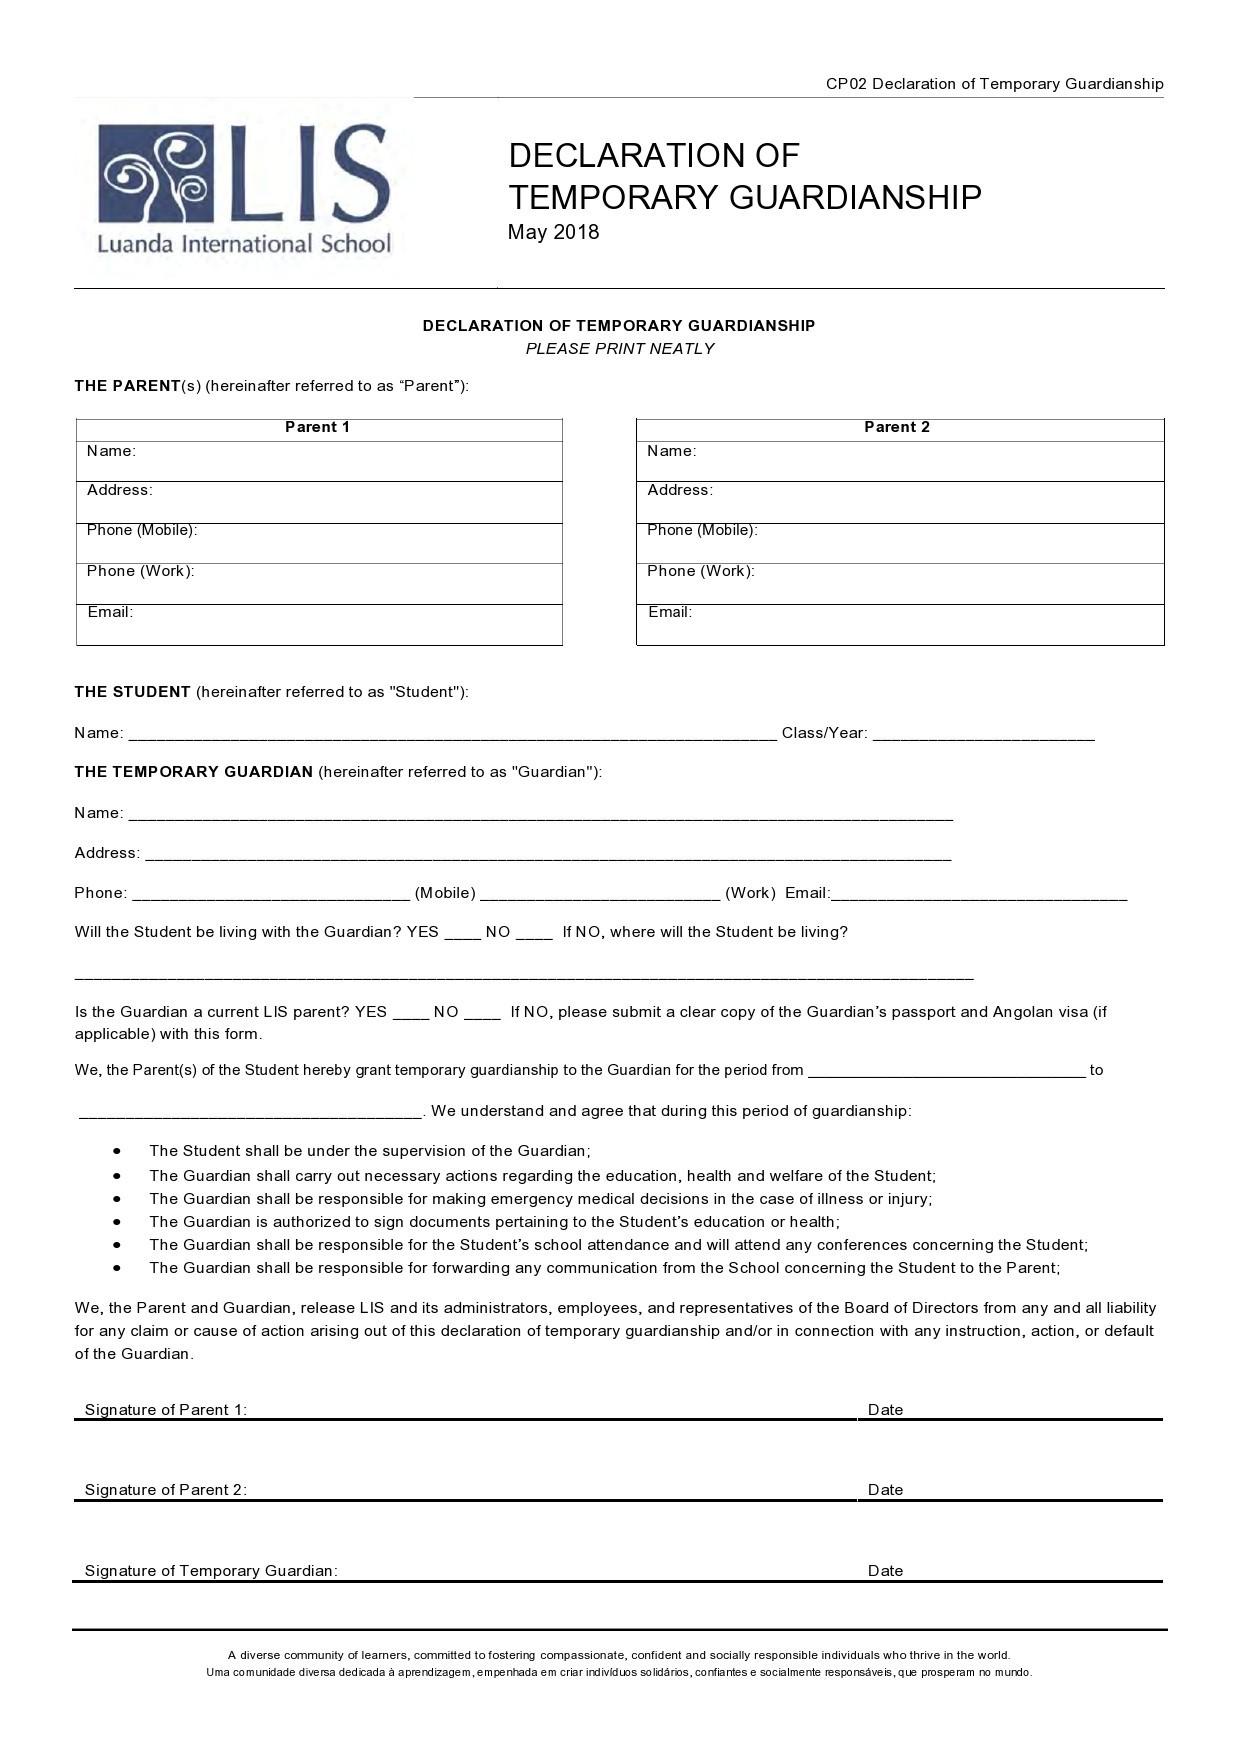 Free guardianship form 16